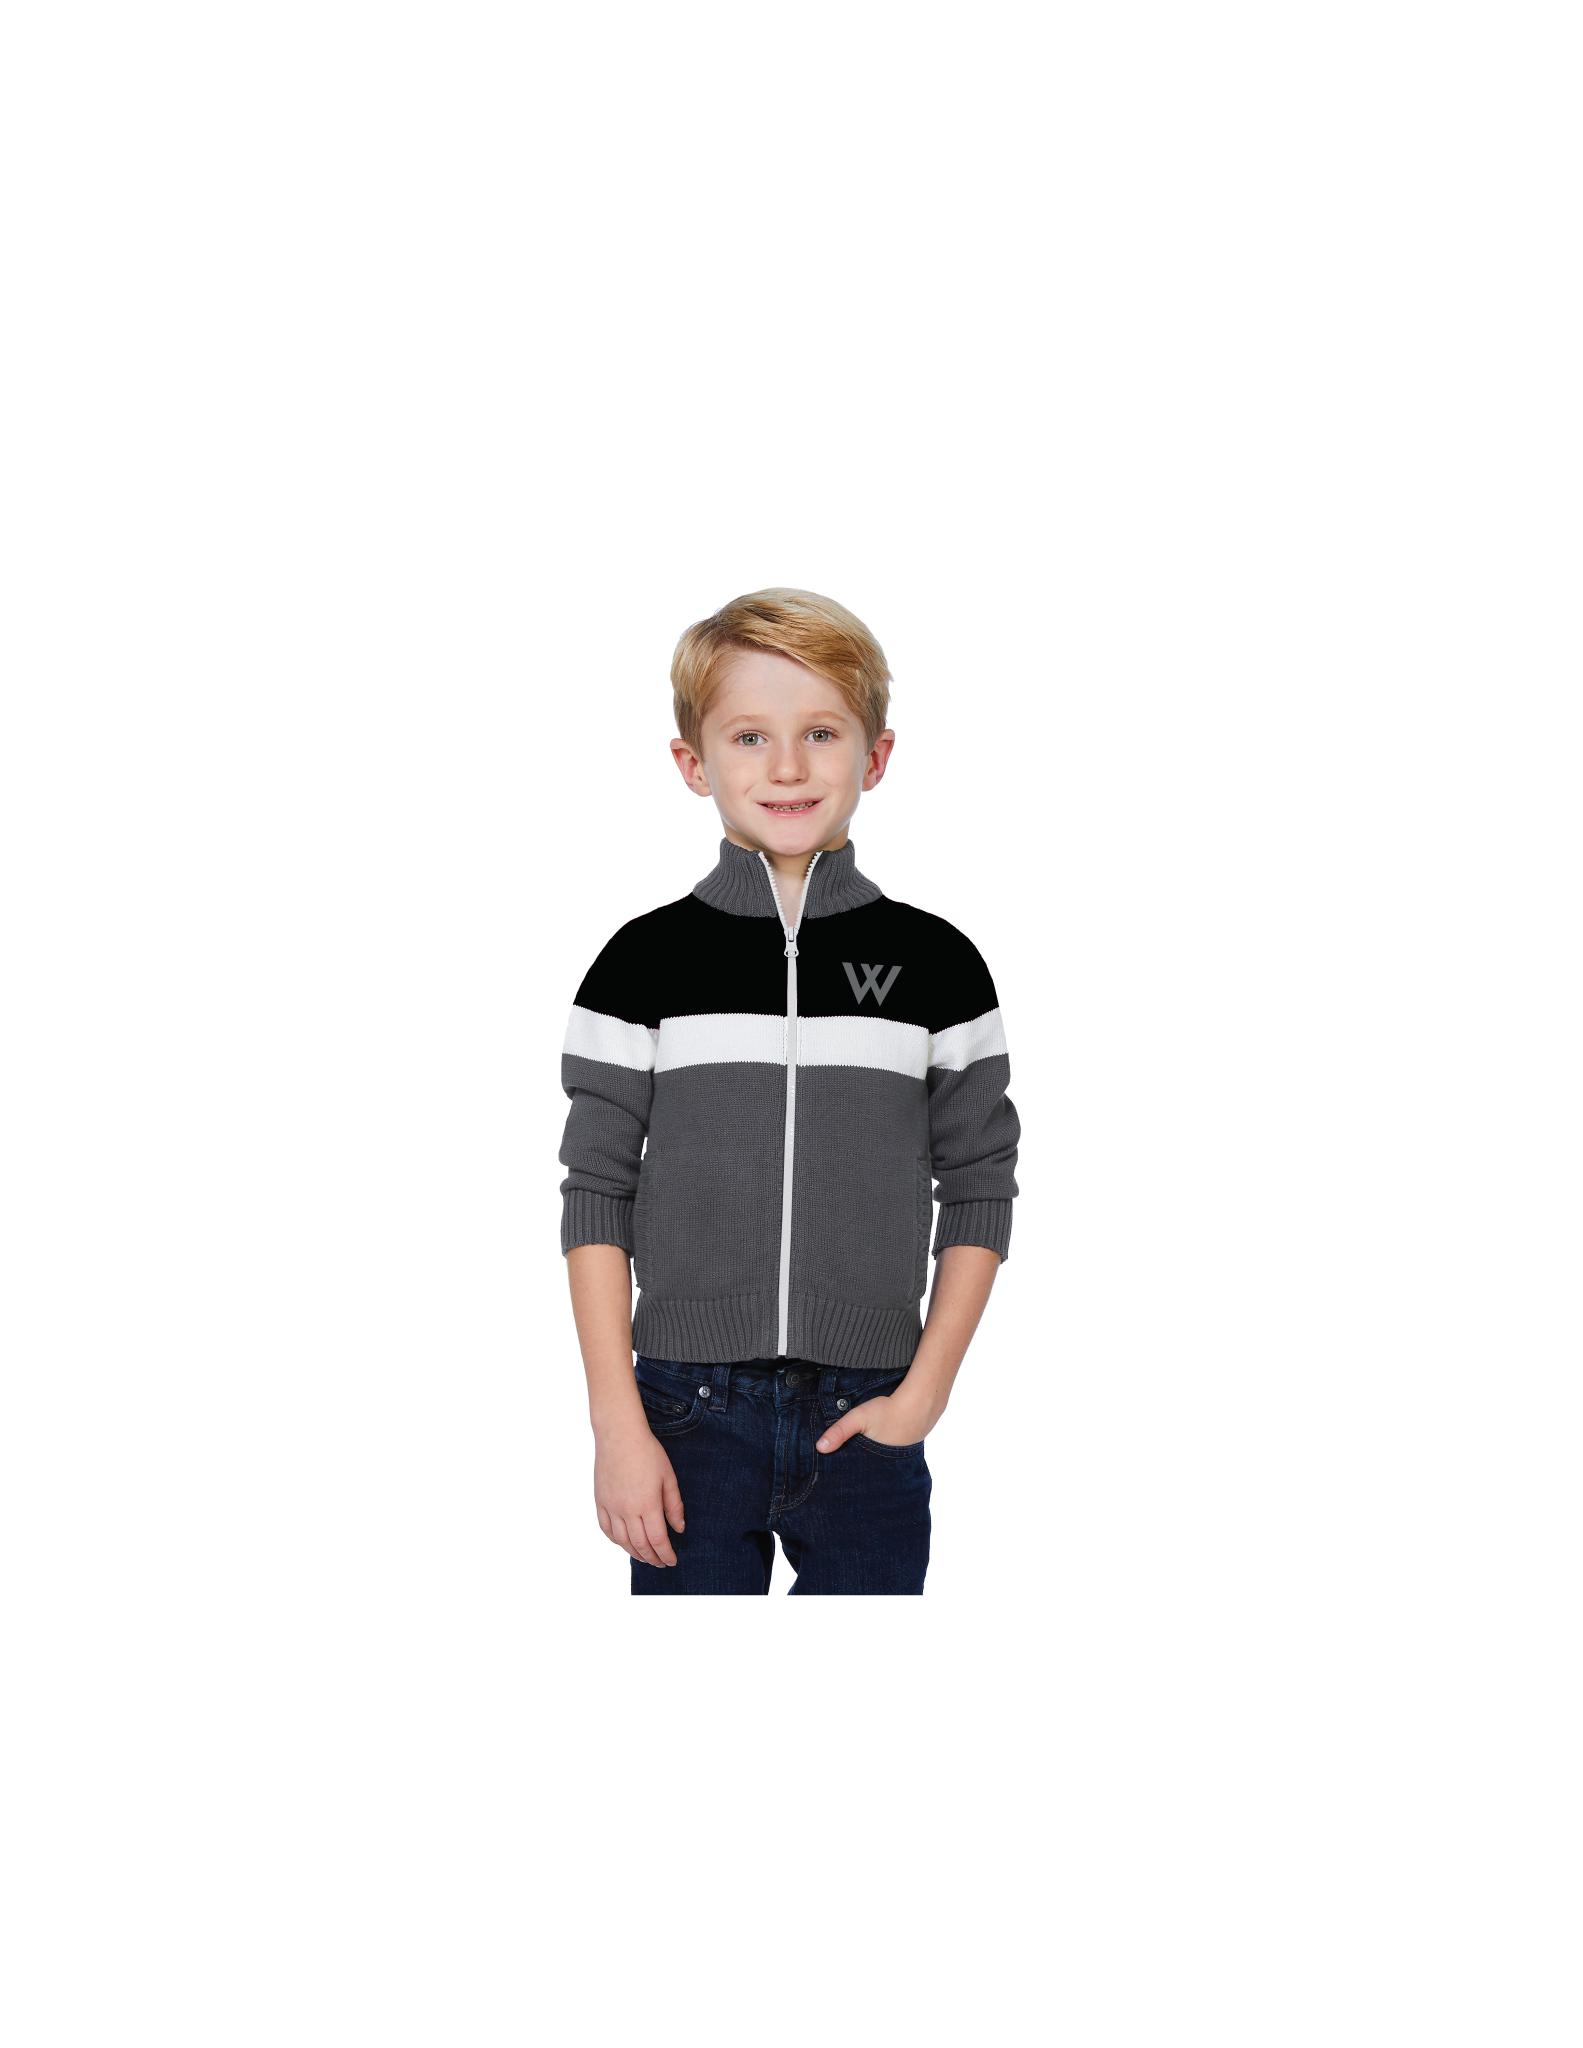 Sweater: Team Full Zip, Gray and Black